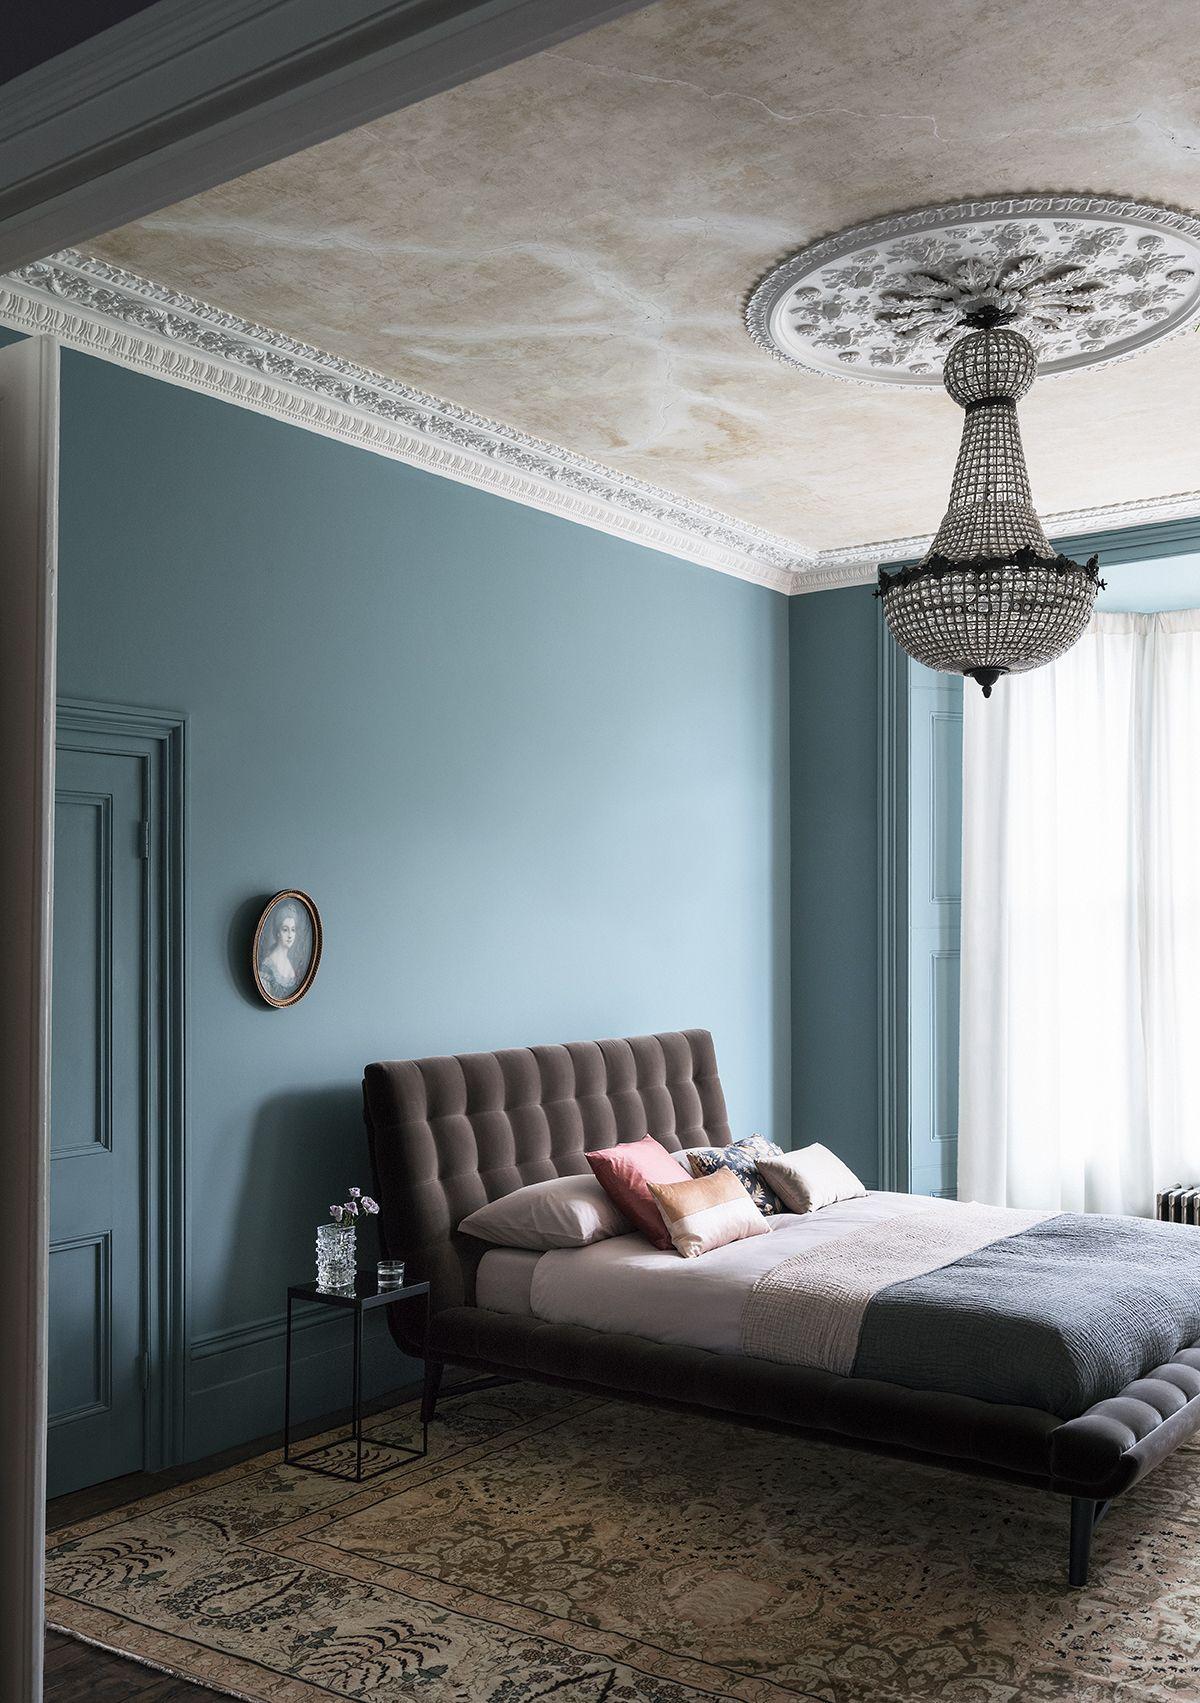 Walls Woodwork in Blue Gum 620 paint ideas home decor – Blue Paint Ideas for Bedroom